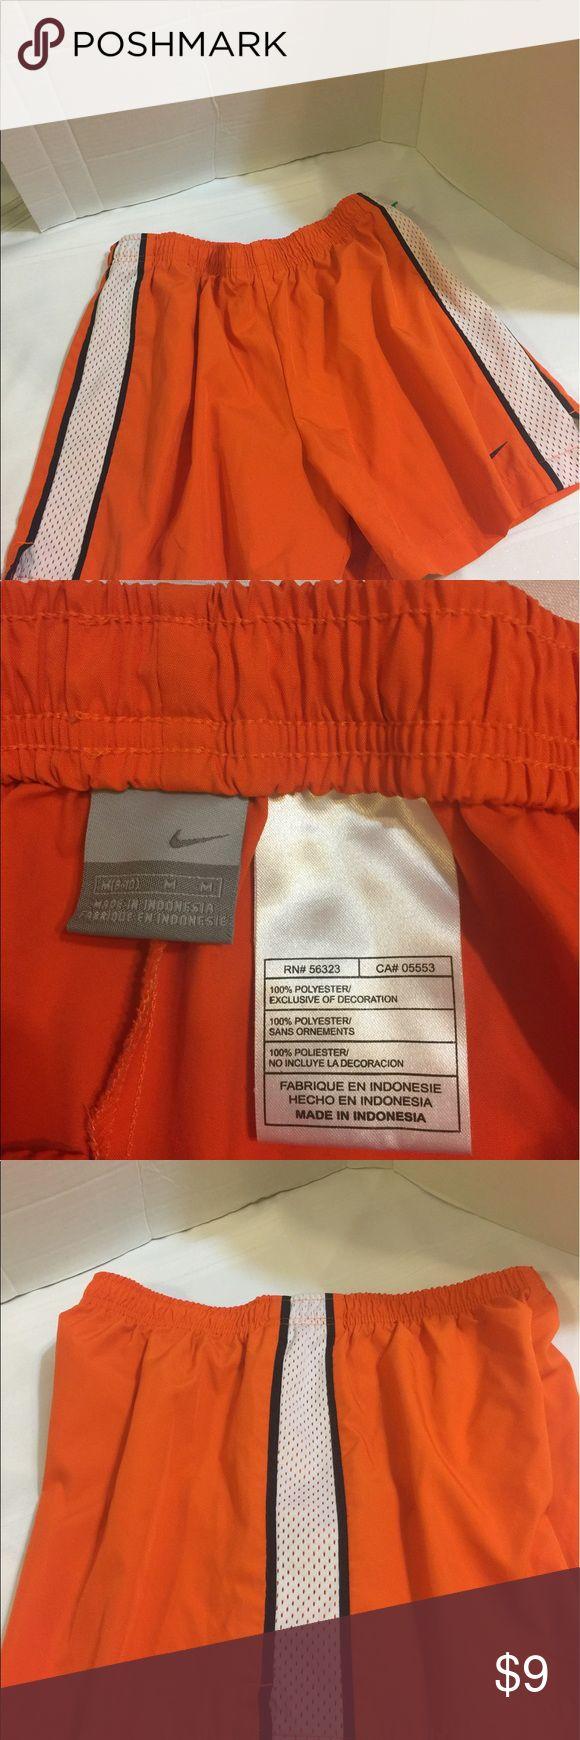 Nike Workout shorts Nike ladies workout shorts .Size M (8-10) Shorts